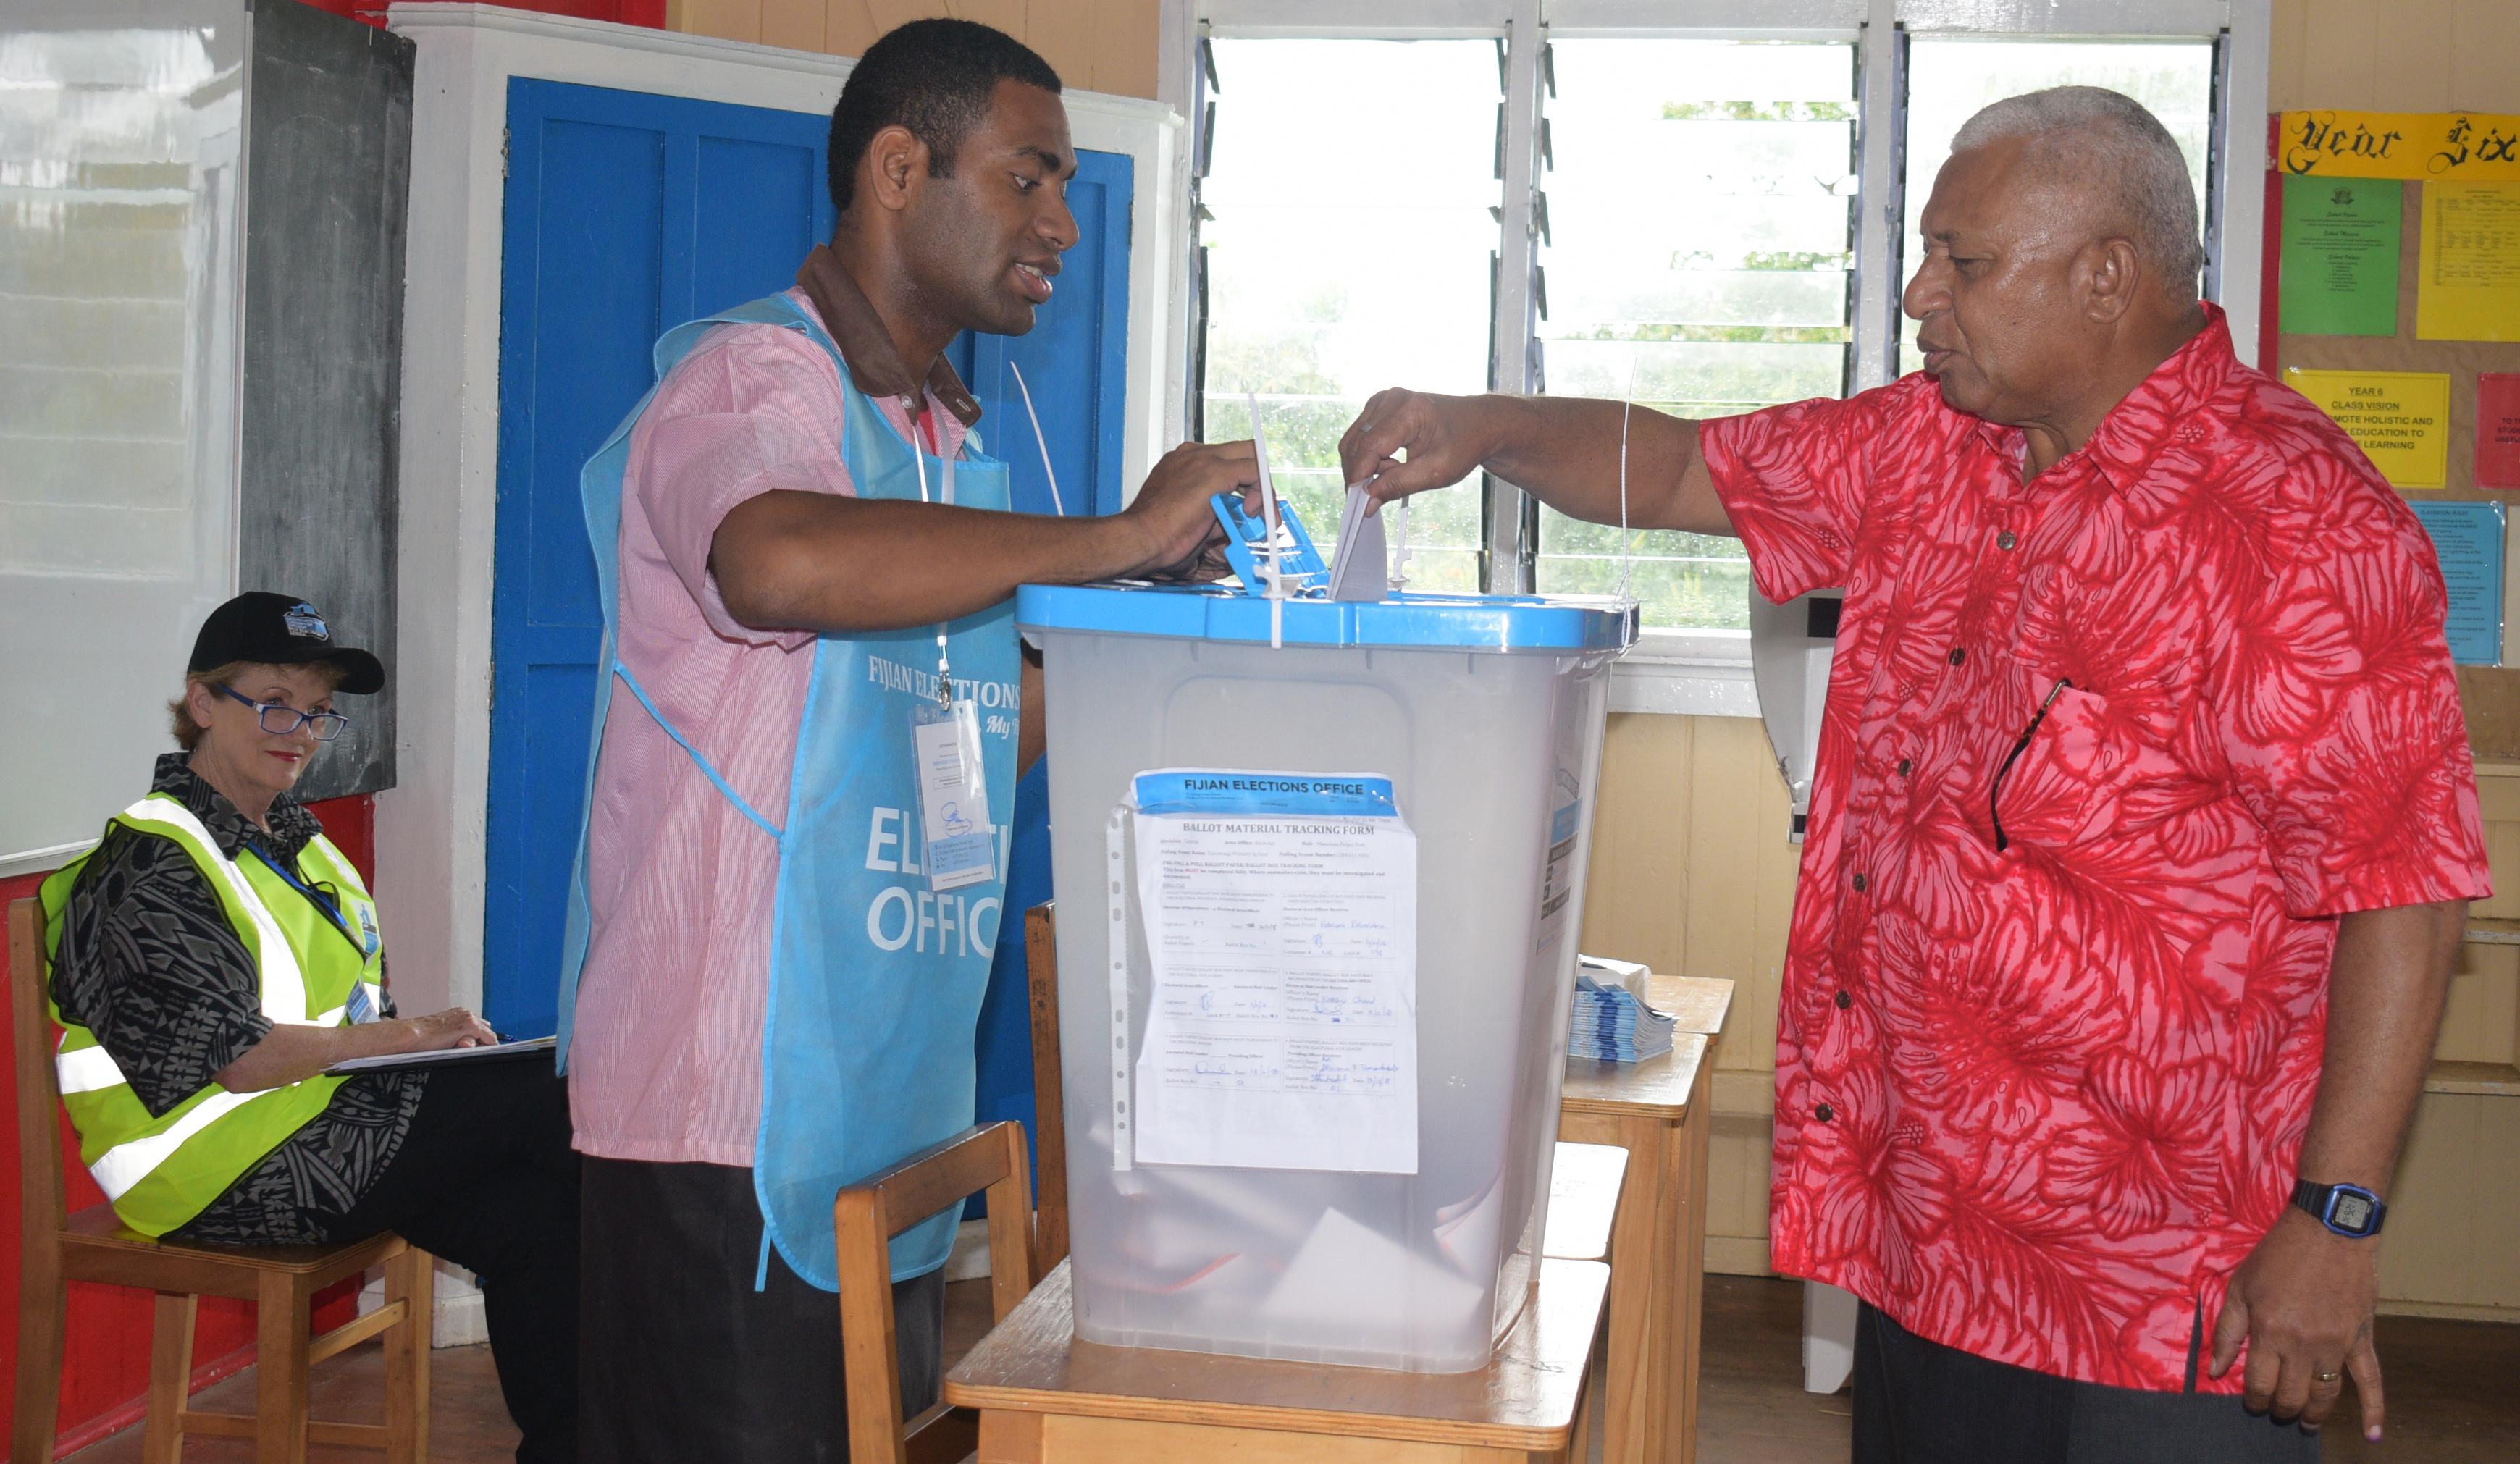 FijiFirst Party leader Voreqe  Bainimarama casts his ballot on  November 14, 2018,  at Vatuwaqa Primary School.  He was accompanied by his wife, Mary.  Ronald Kumar Chief photo journalist